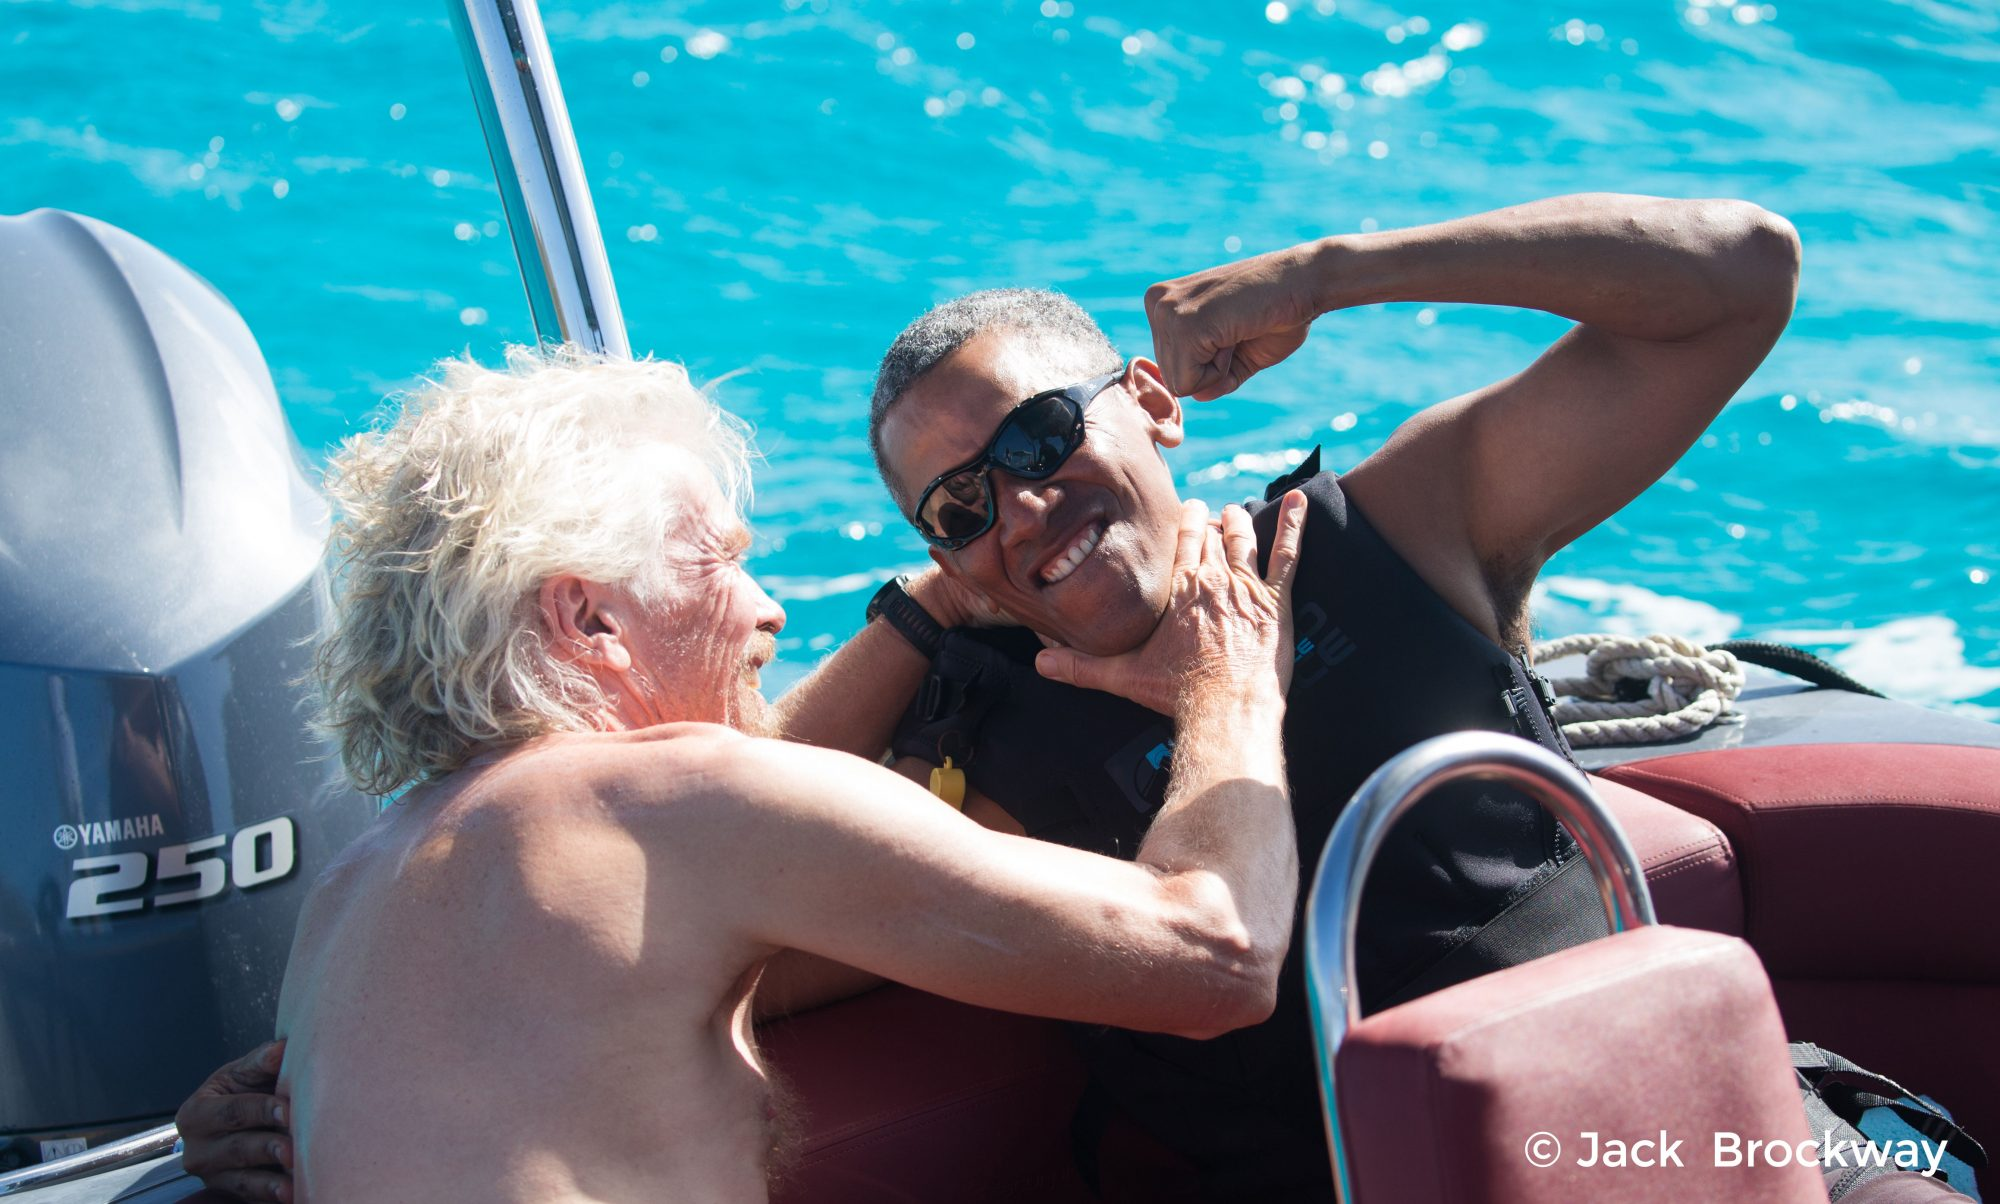 Barack Obama and Richard Branson